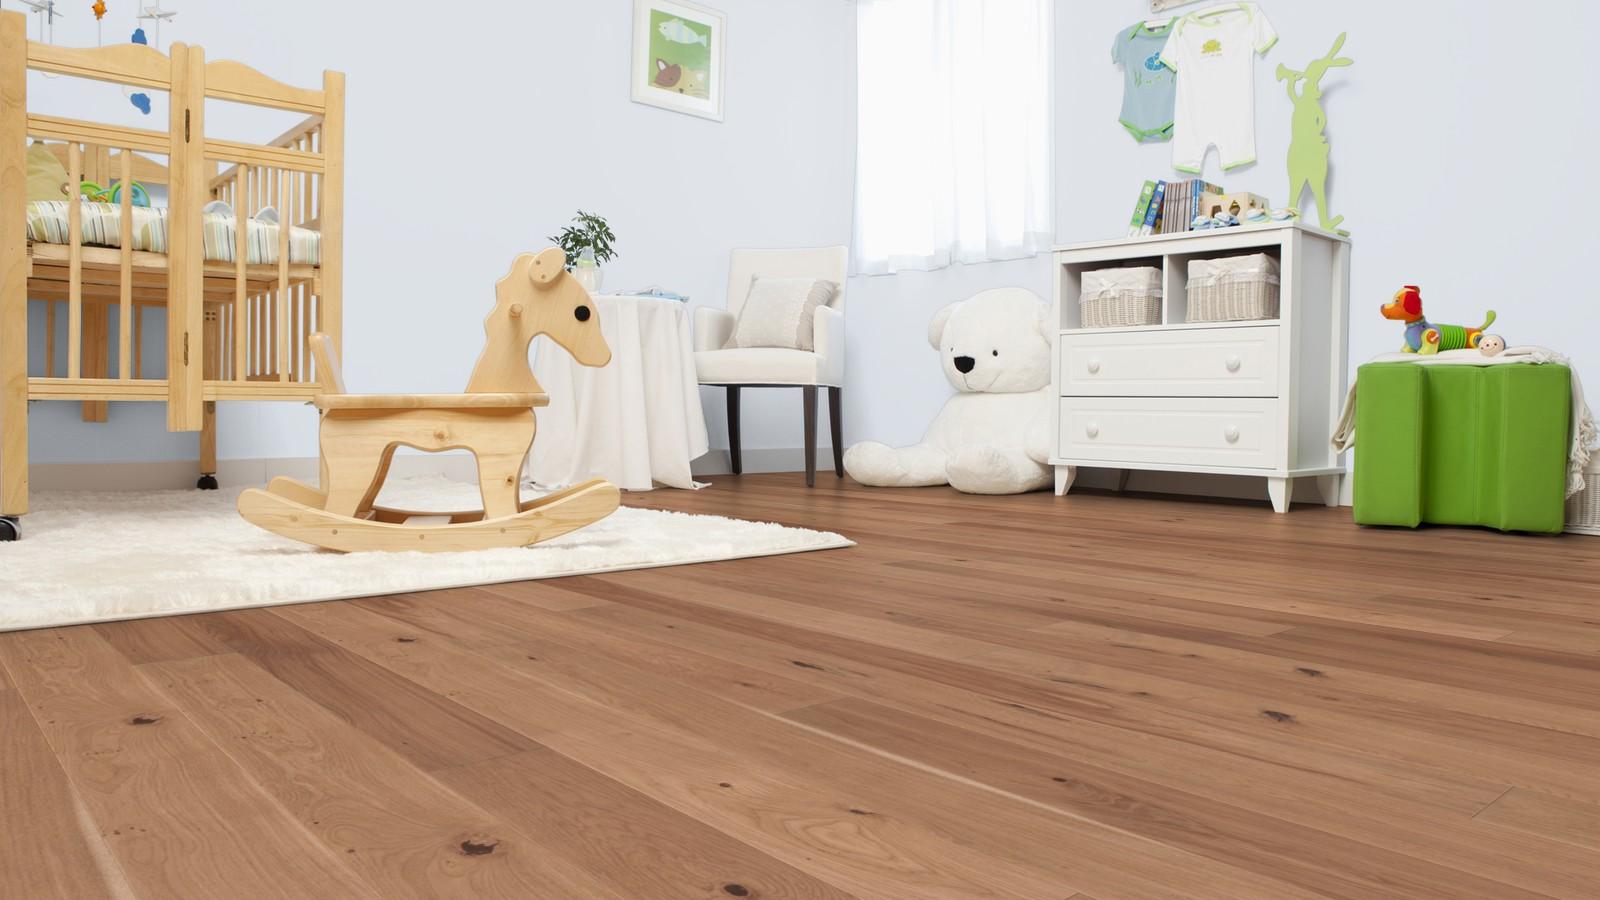 ter h rne sensual collection l parkett l c15 eiche karamellbeige l landhausdiele preisbrecher. Black Bedroom Furniture Sets. Home Design Ideas